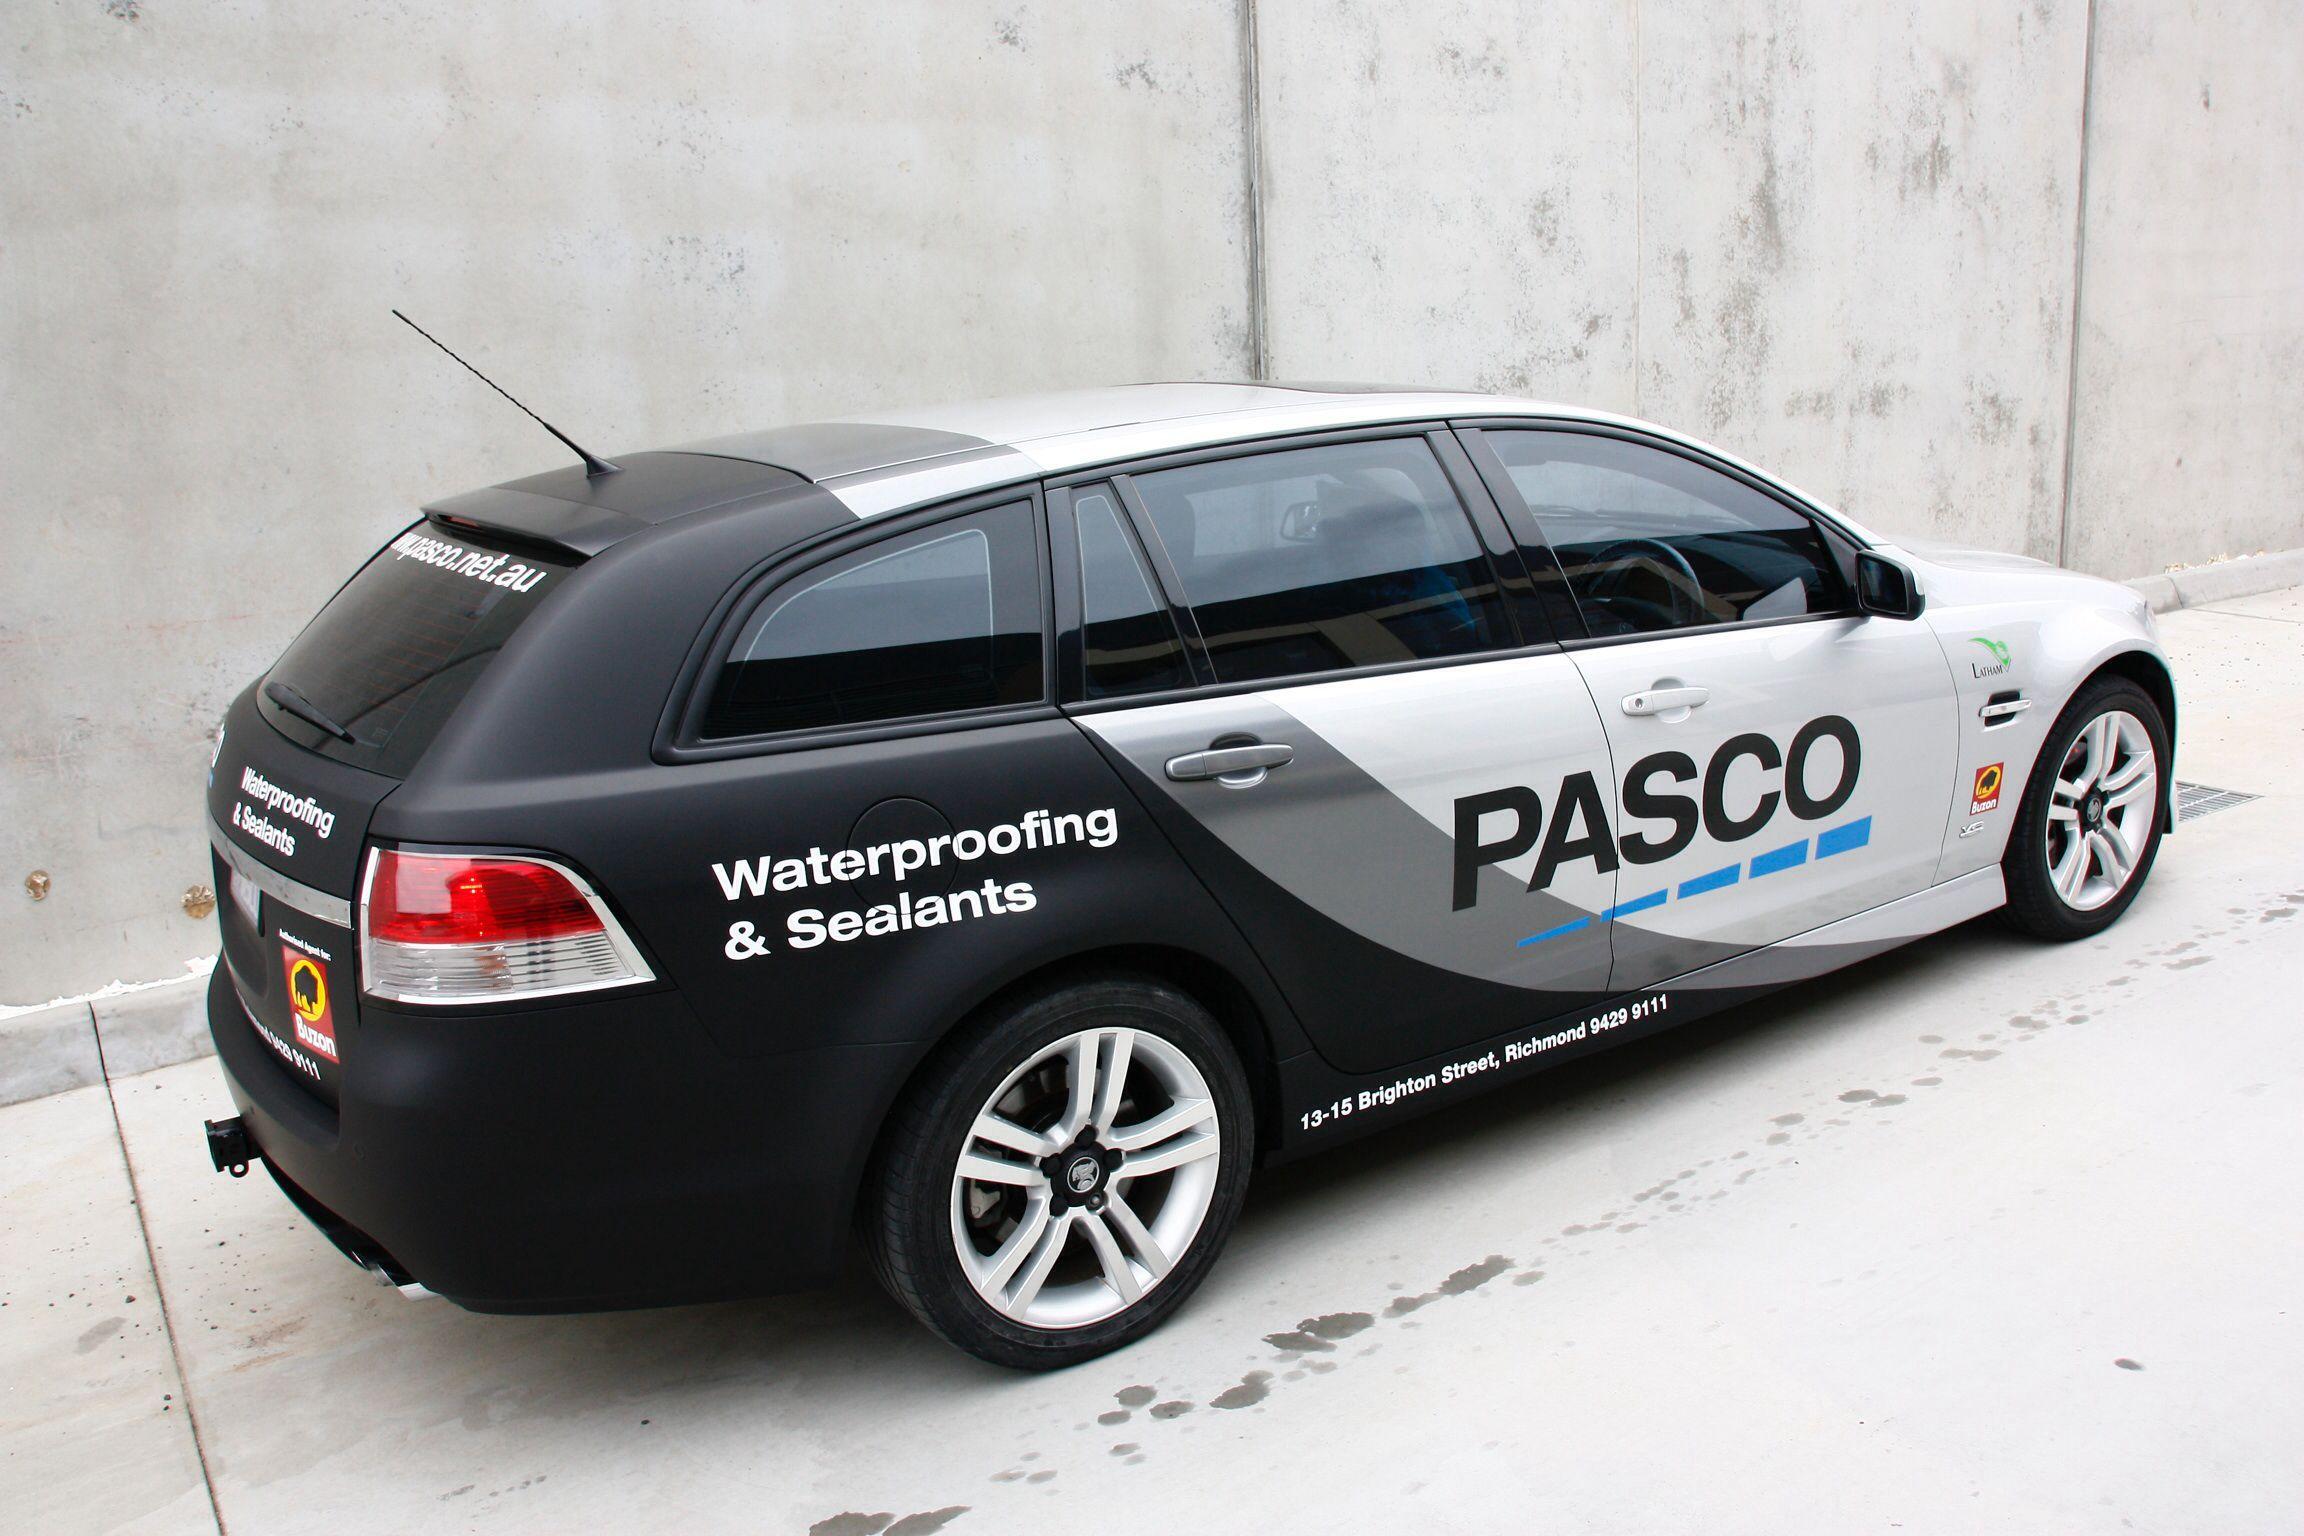 Pasco Half Wrap Side View Design Print Install By Sign Dazign Melbourne Australia Car Lettering Vehicle Signage Car Wrap Design [ 1536 x 2304 Pixel ]